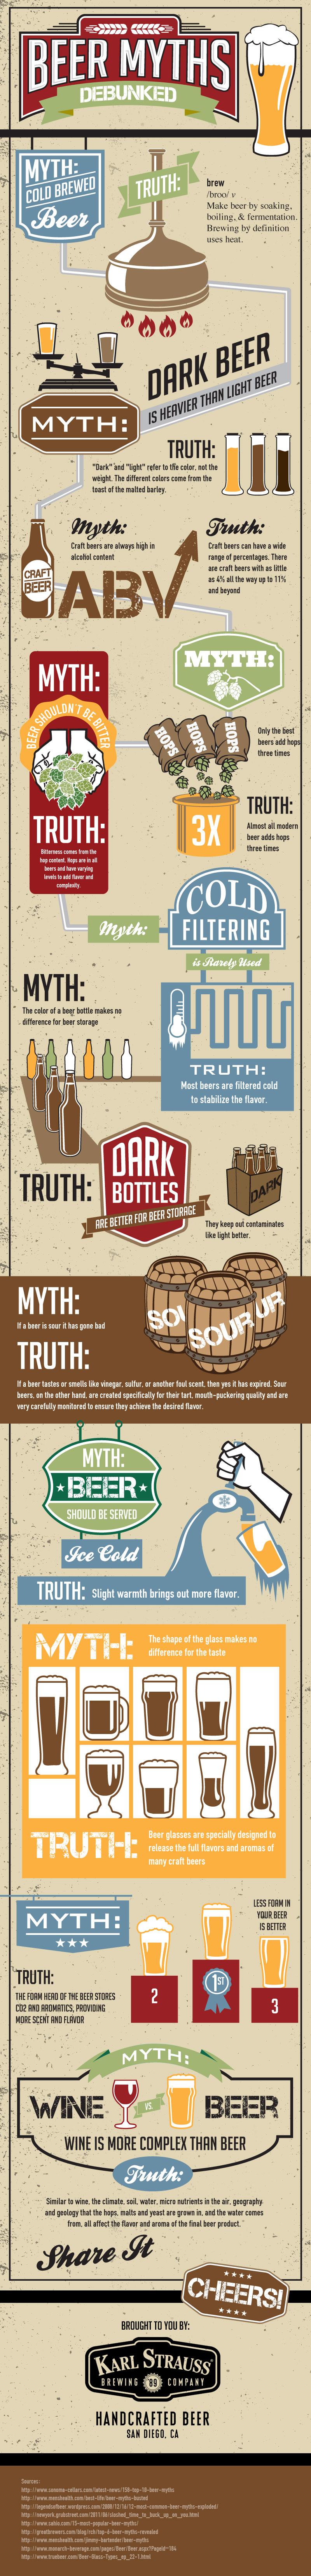 Karl-Strauss-beer-myths-v5